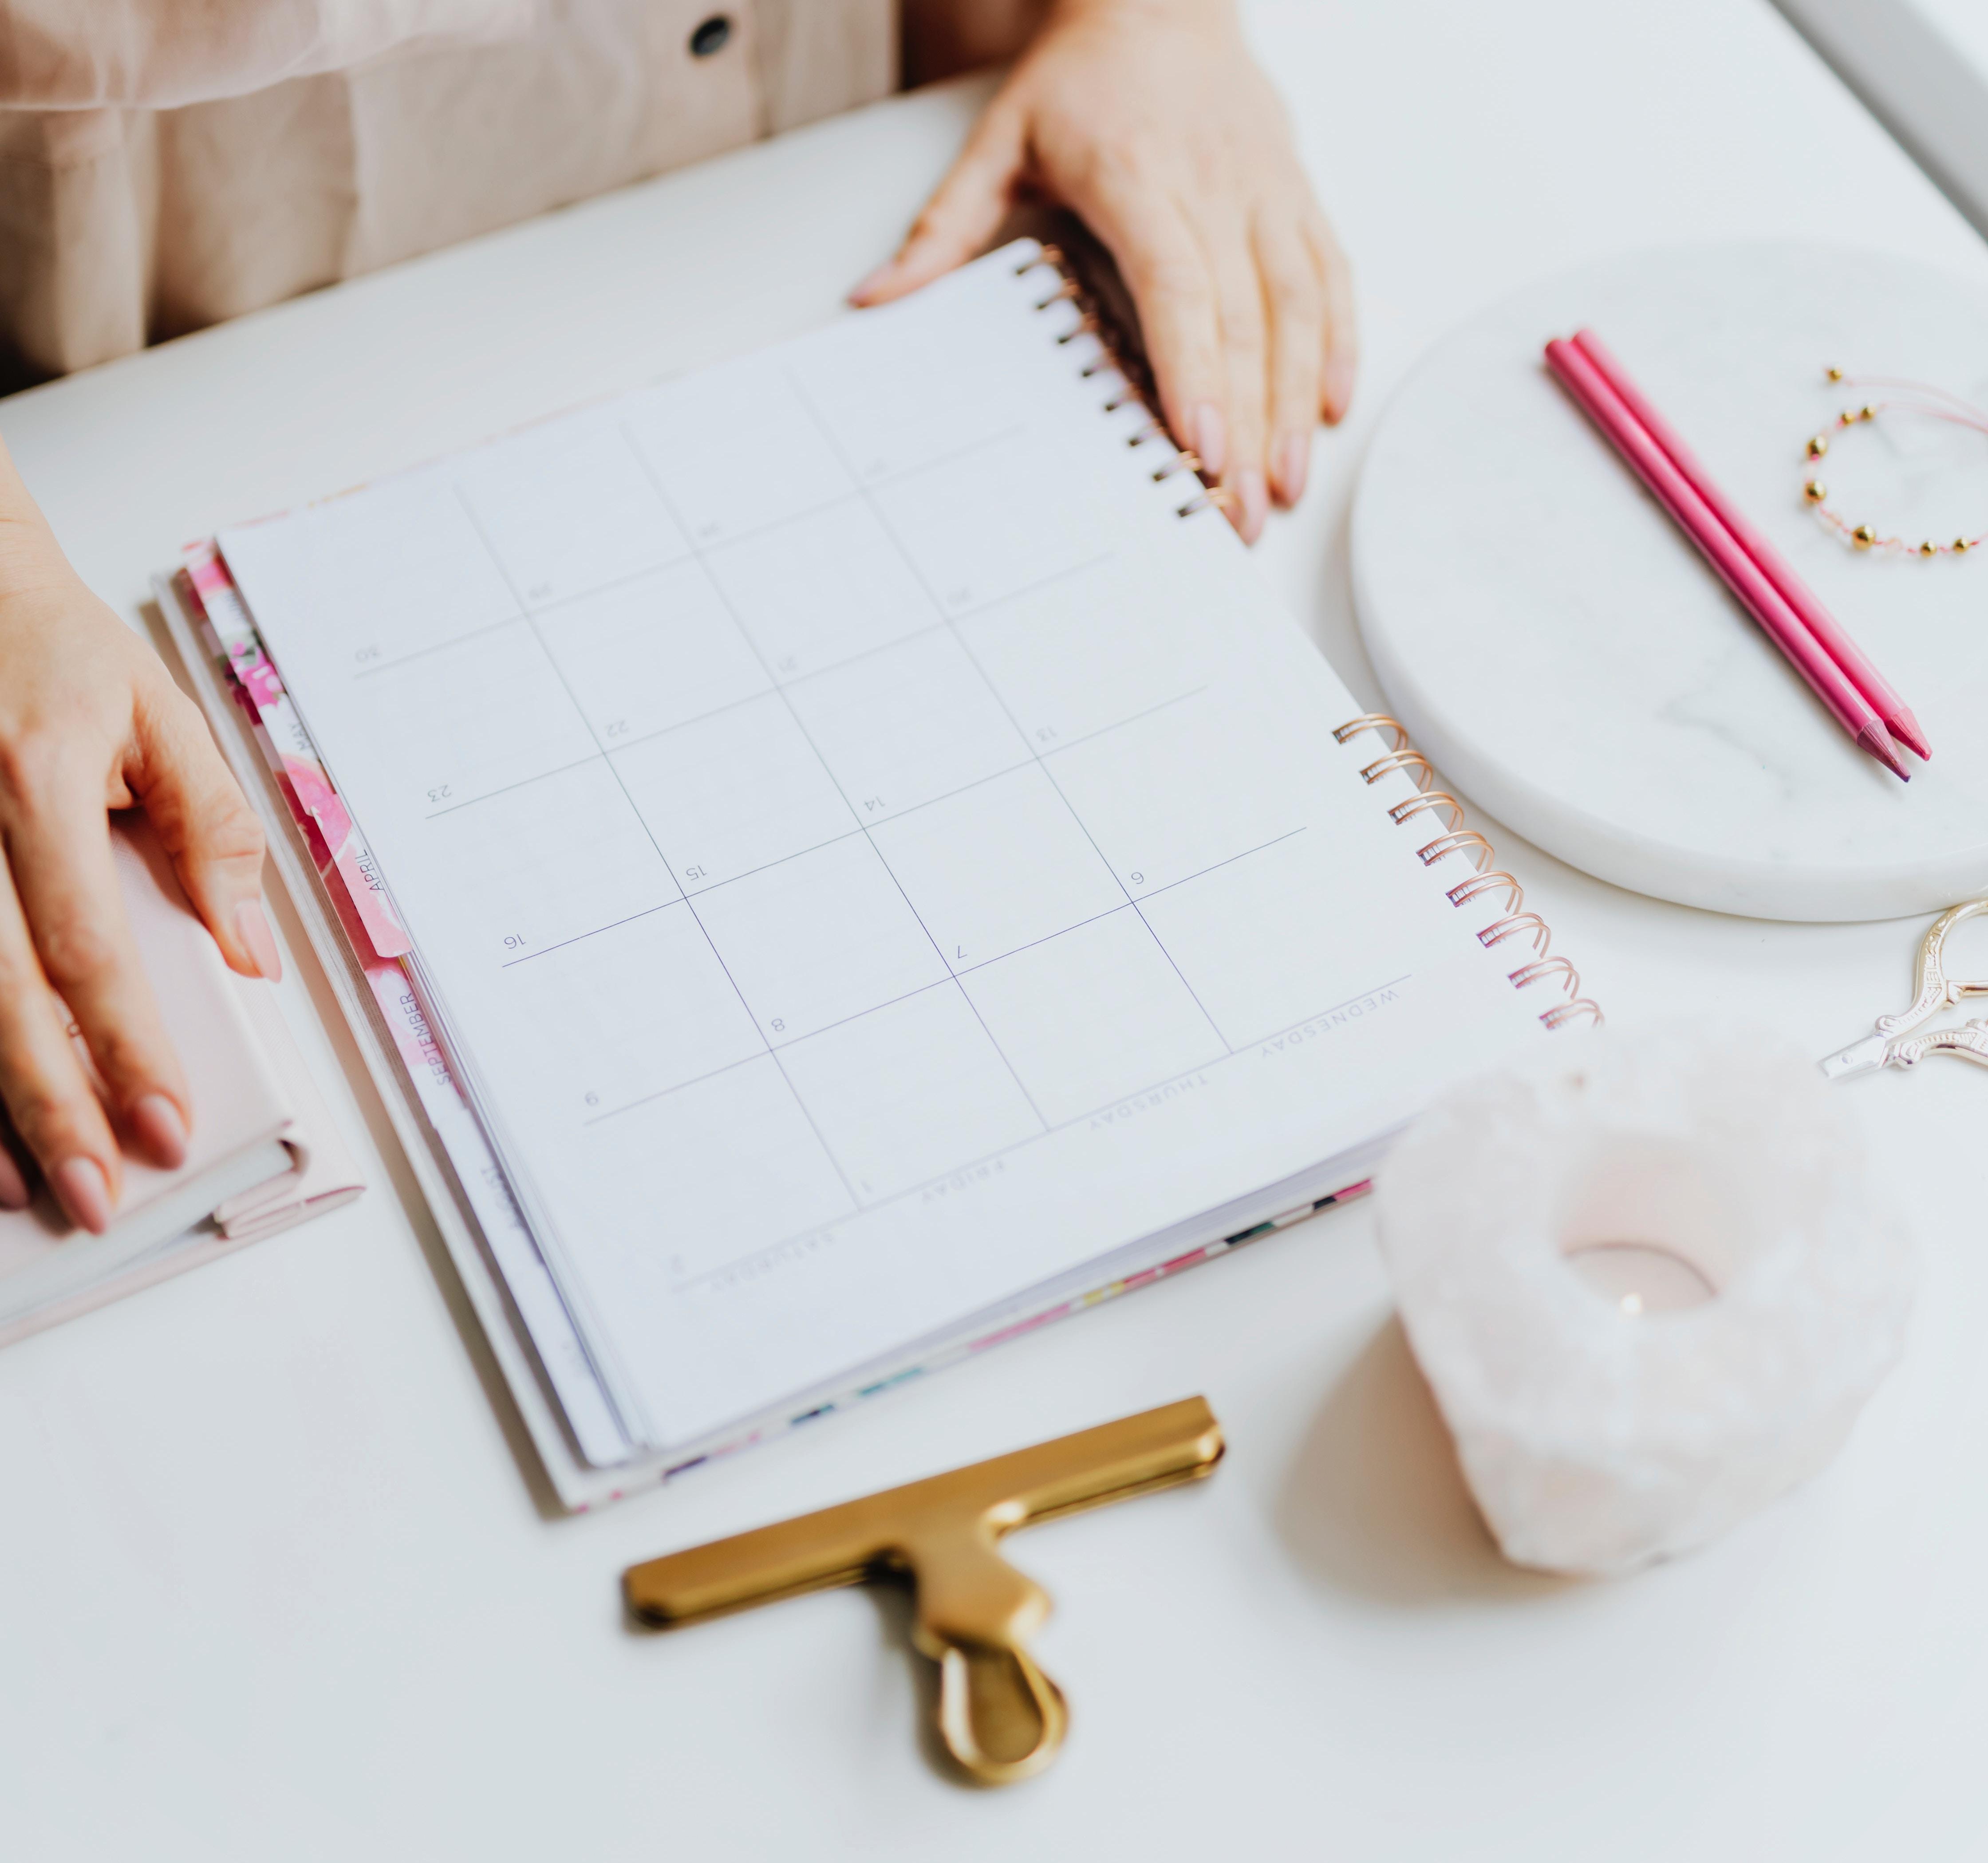 a calendar sitting on a desk